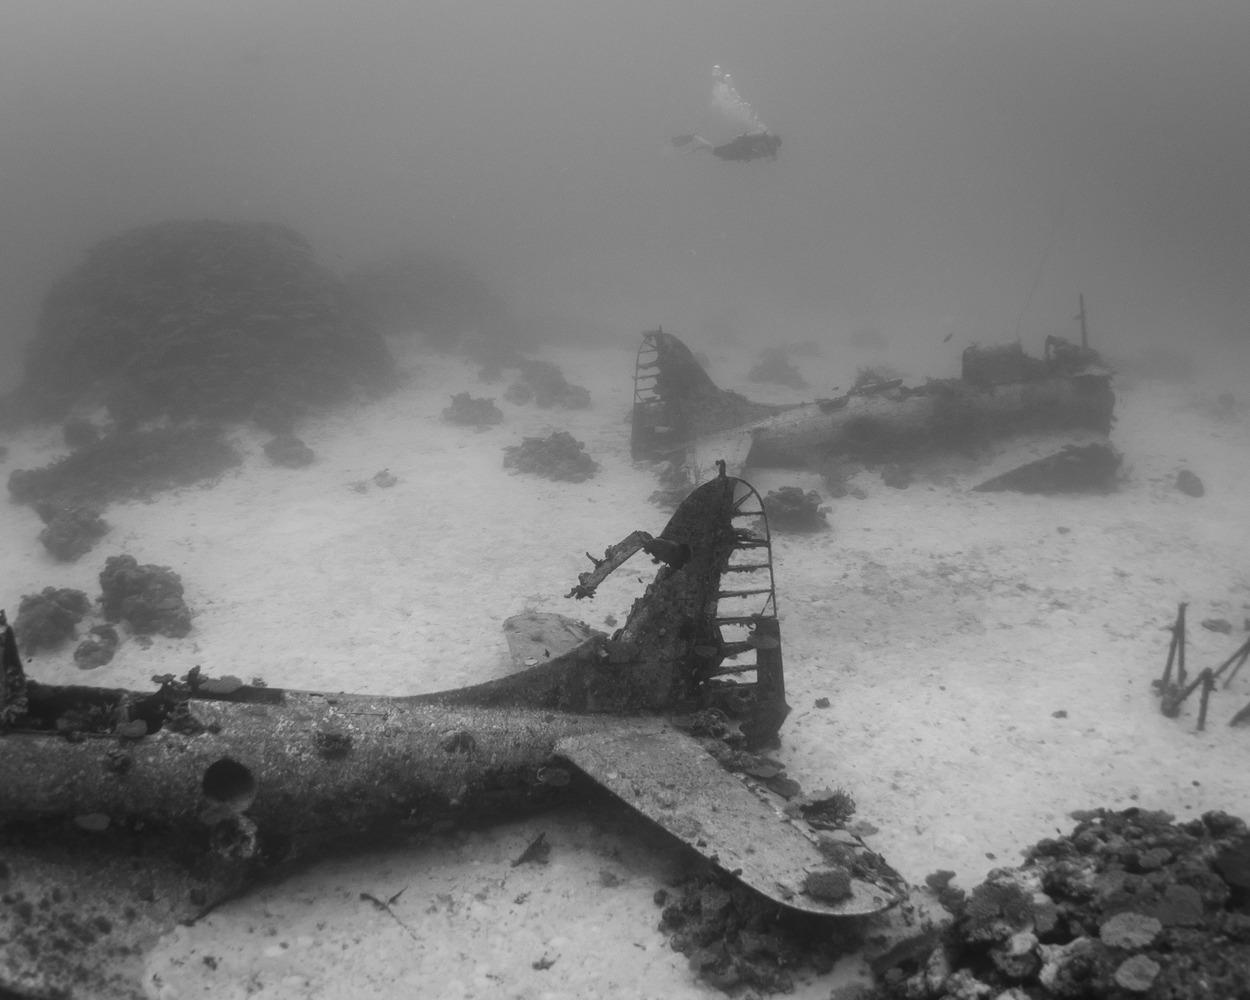 Avion Segunda Guerra Mundial bajo el agua 1